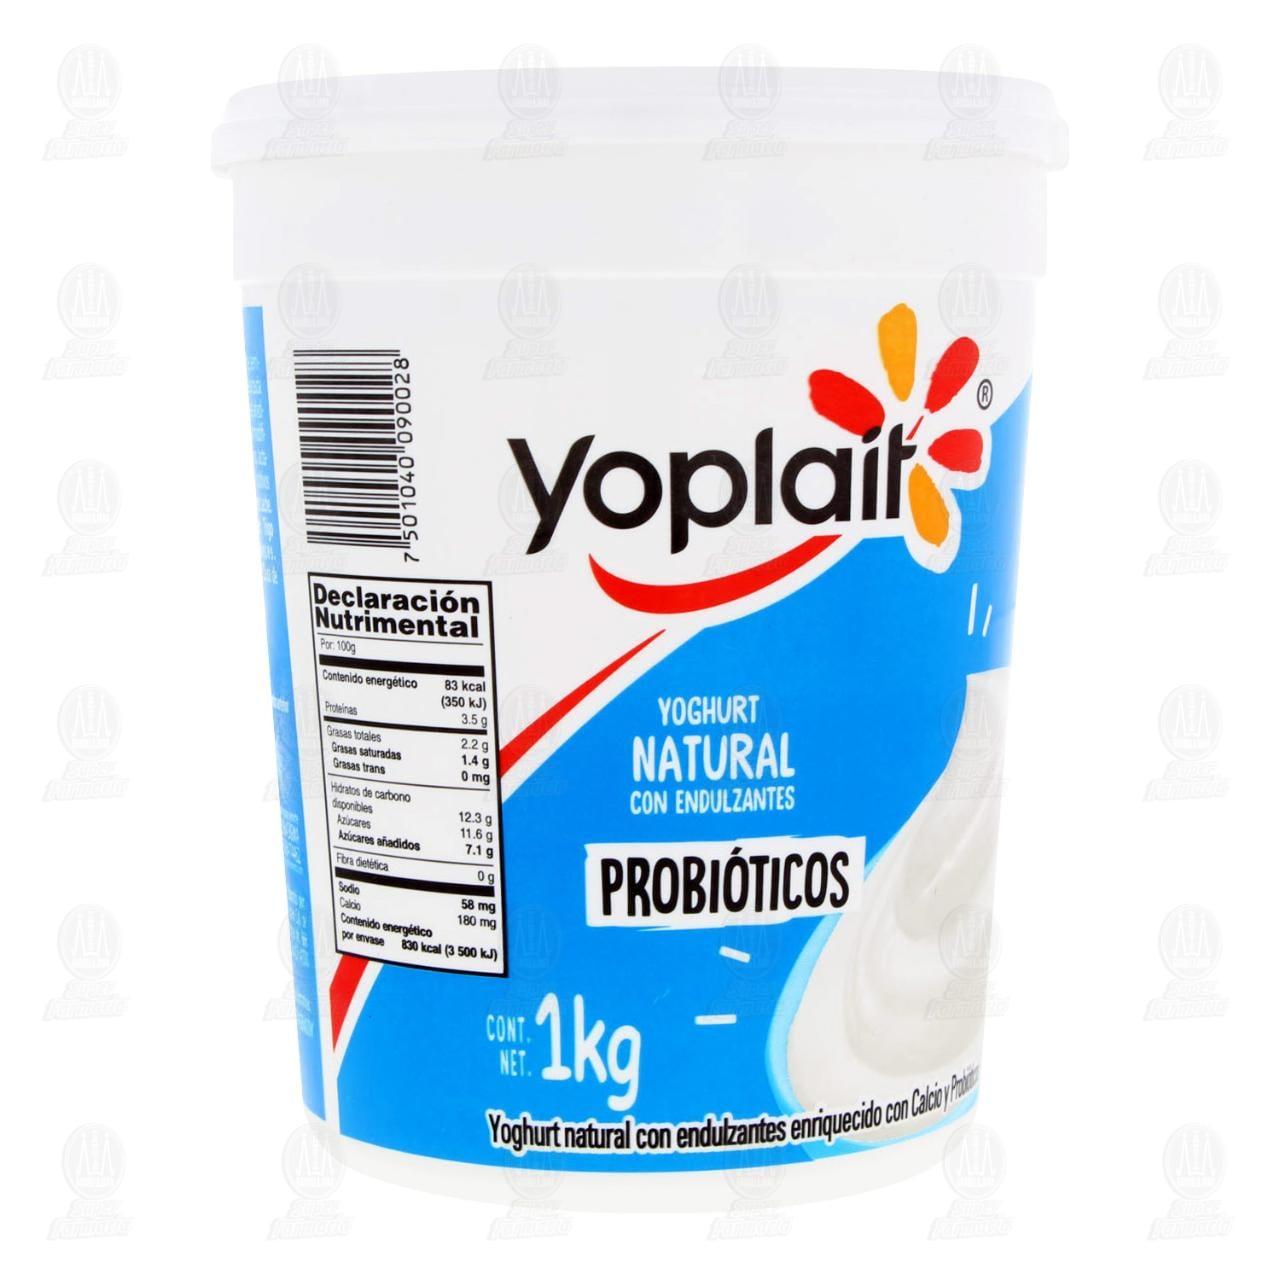 Yoghurt Yoplait Natural, 1 kg.